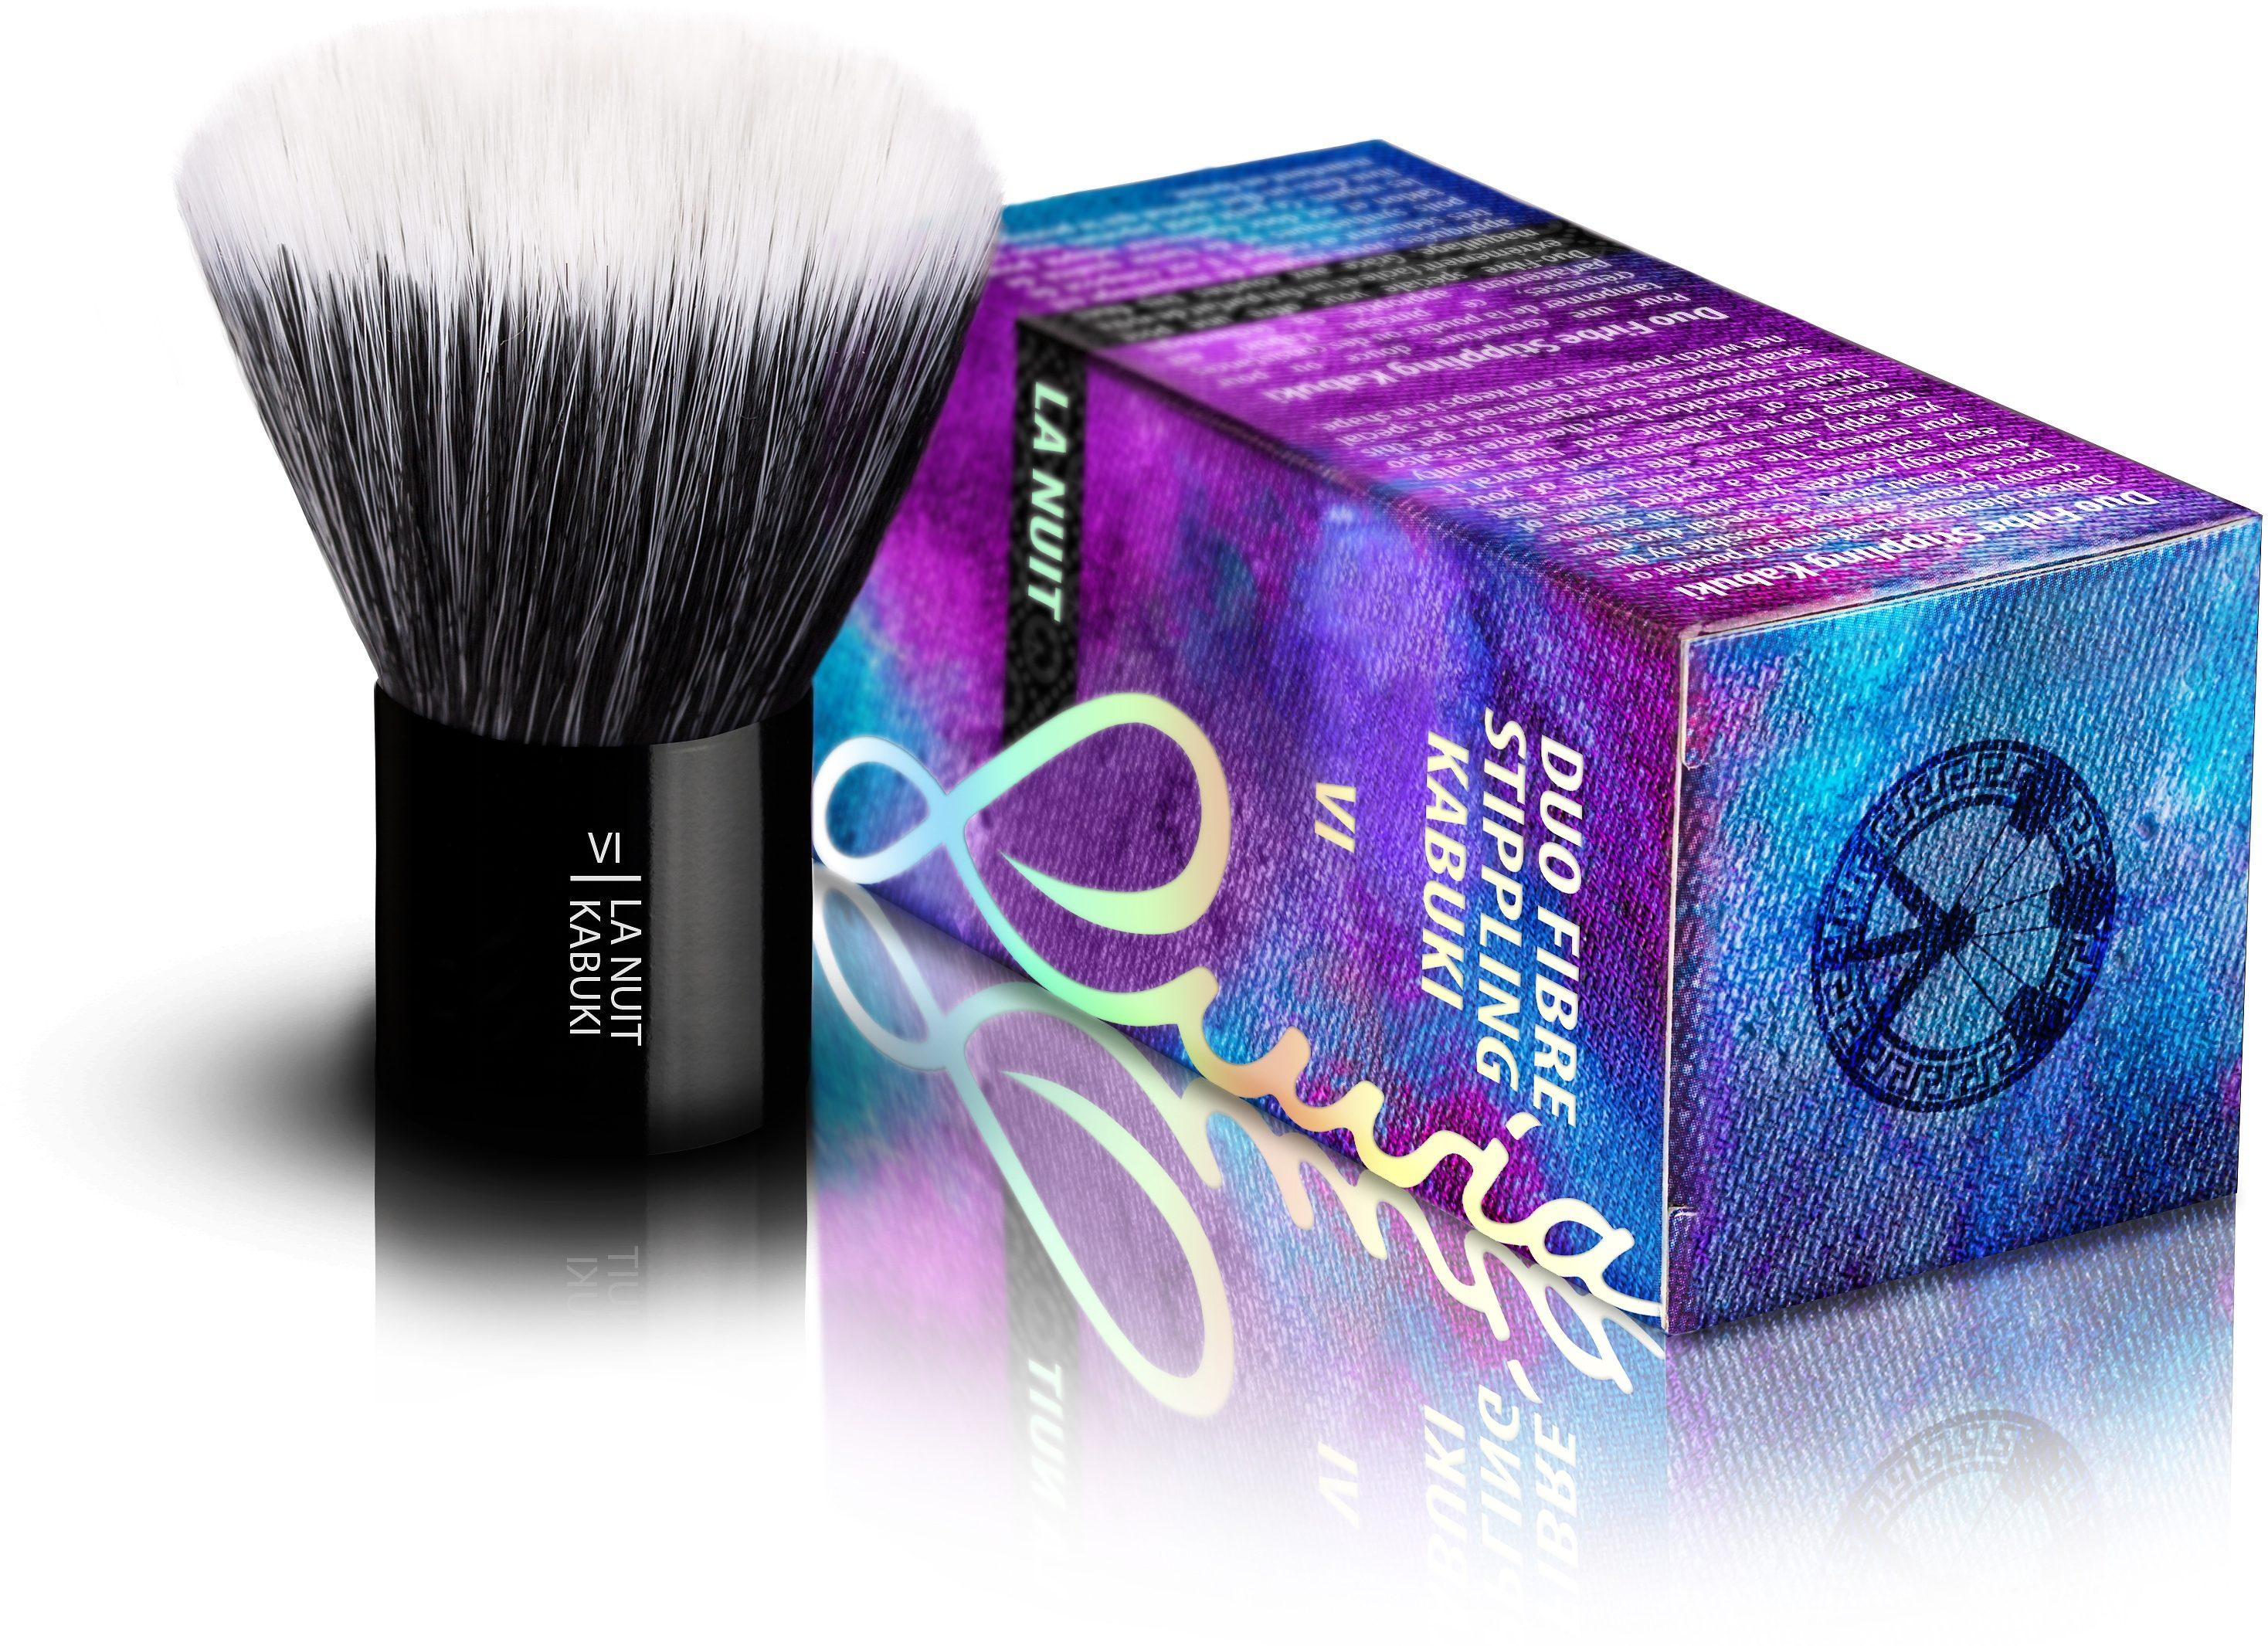 Luvia Cosmetics, »La Nuit-VI Duo Fibre Stippling Kabuki«, Veganer Kabuki Kosmetikpinsel